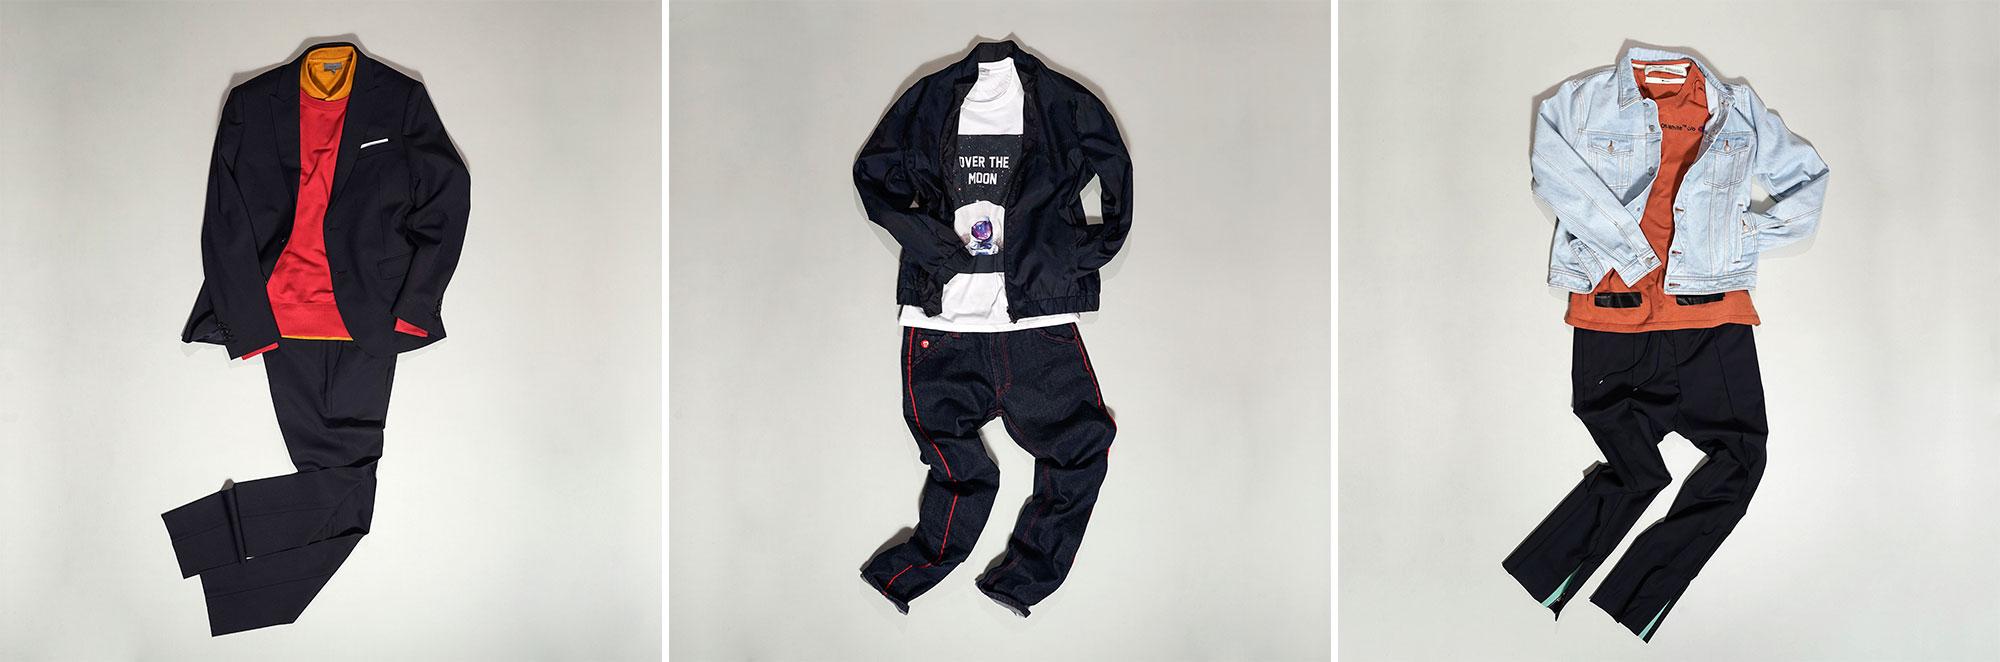 CaballeroCosmica-Fashion-Yusty8.jpg